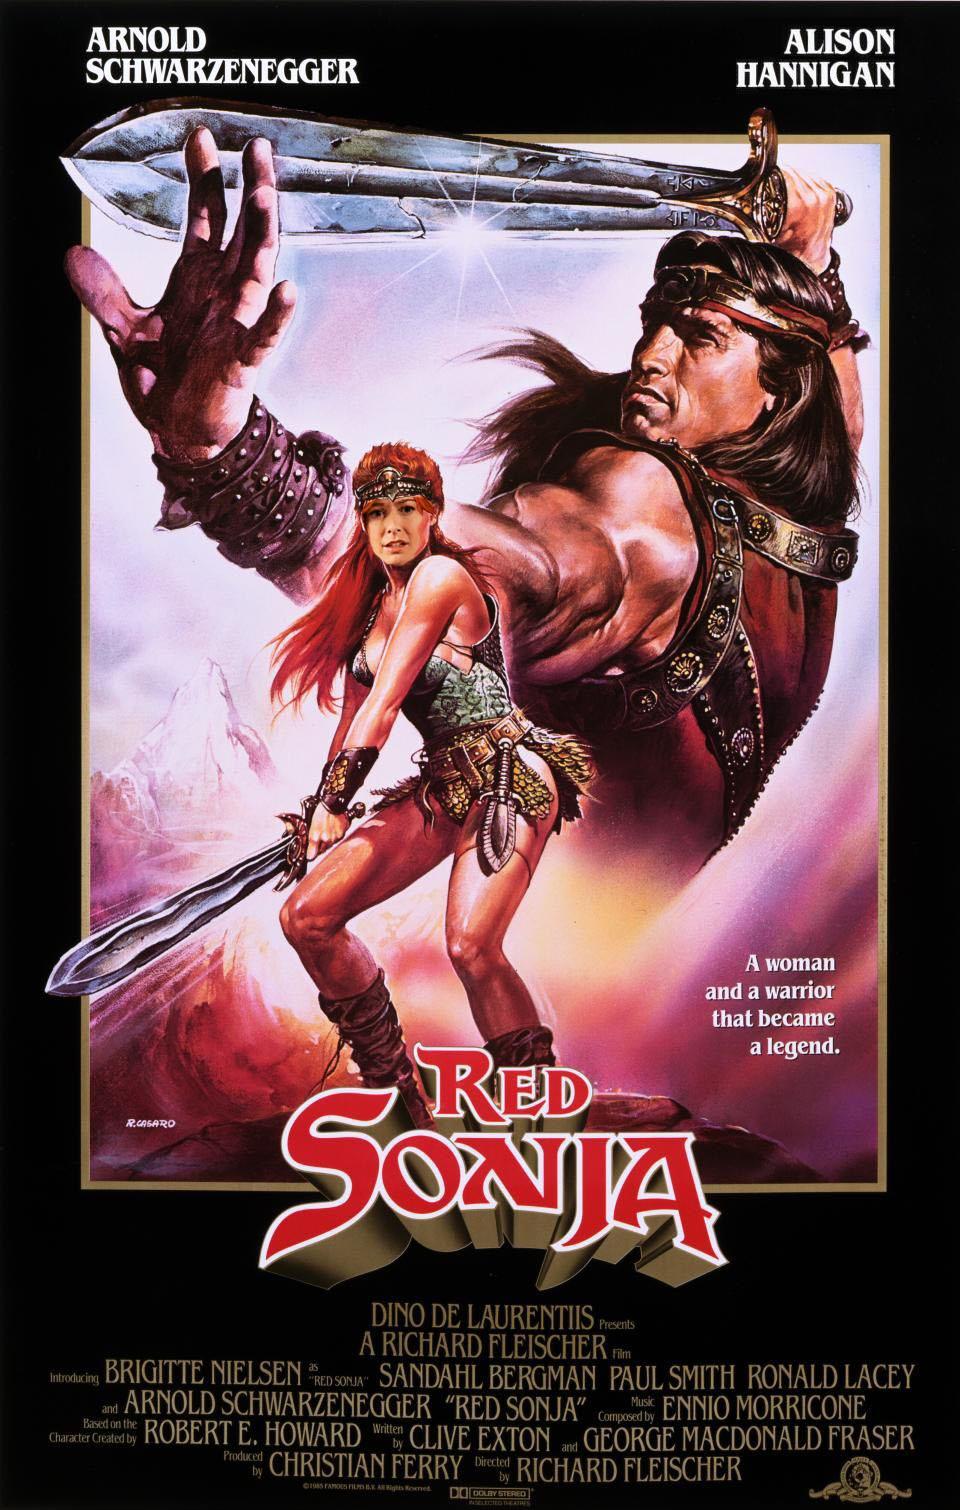 DDJJ: Red Sonja